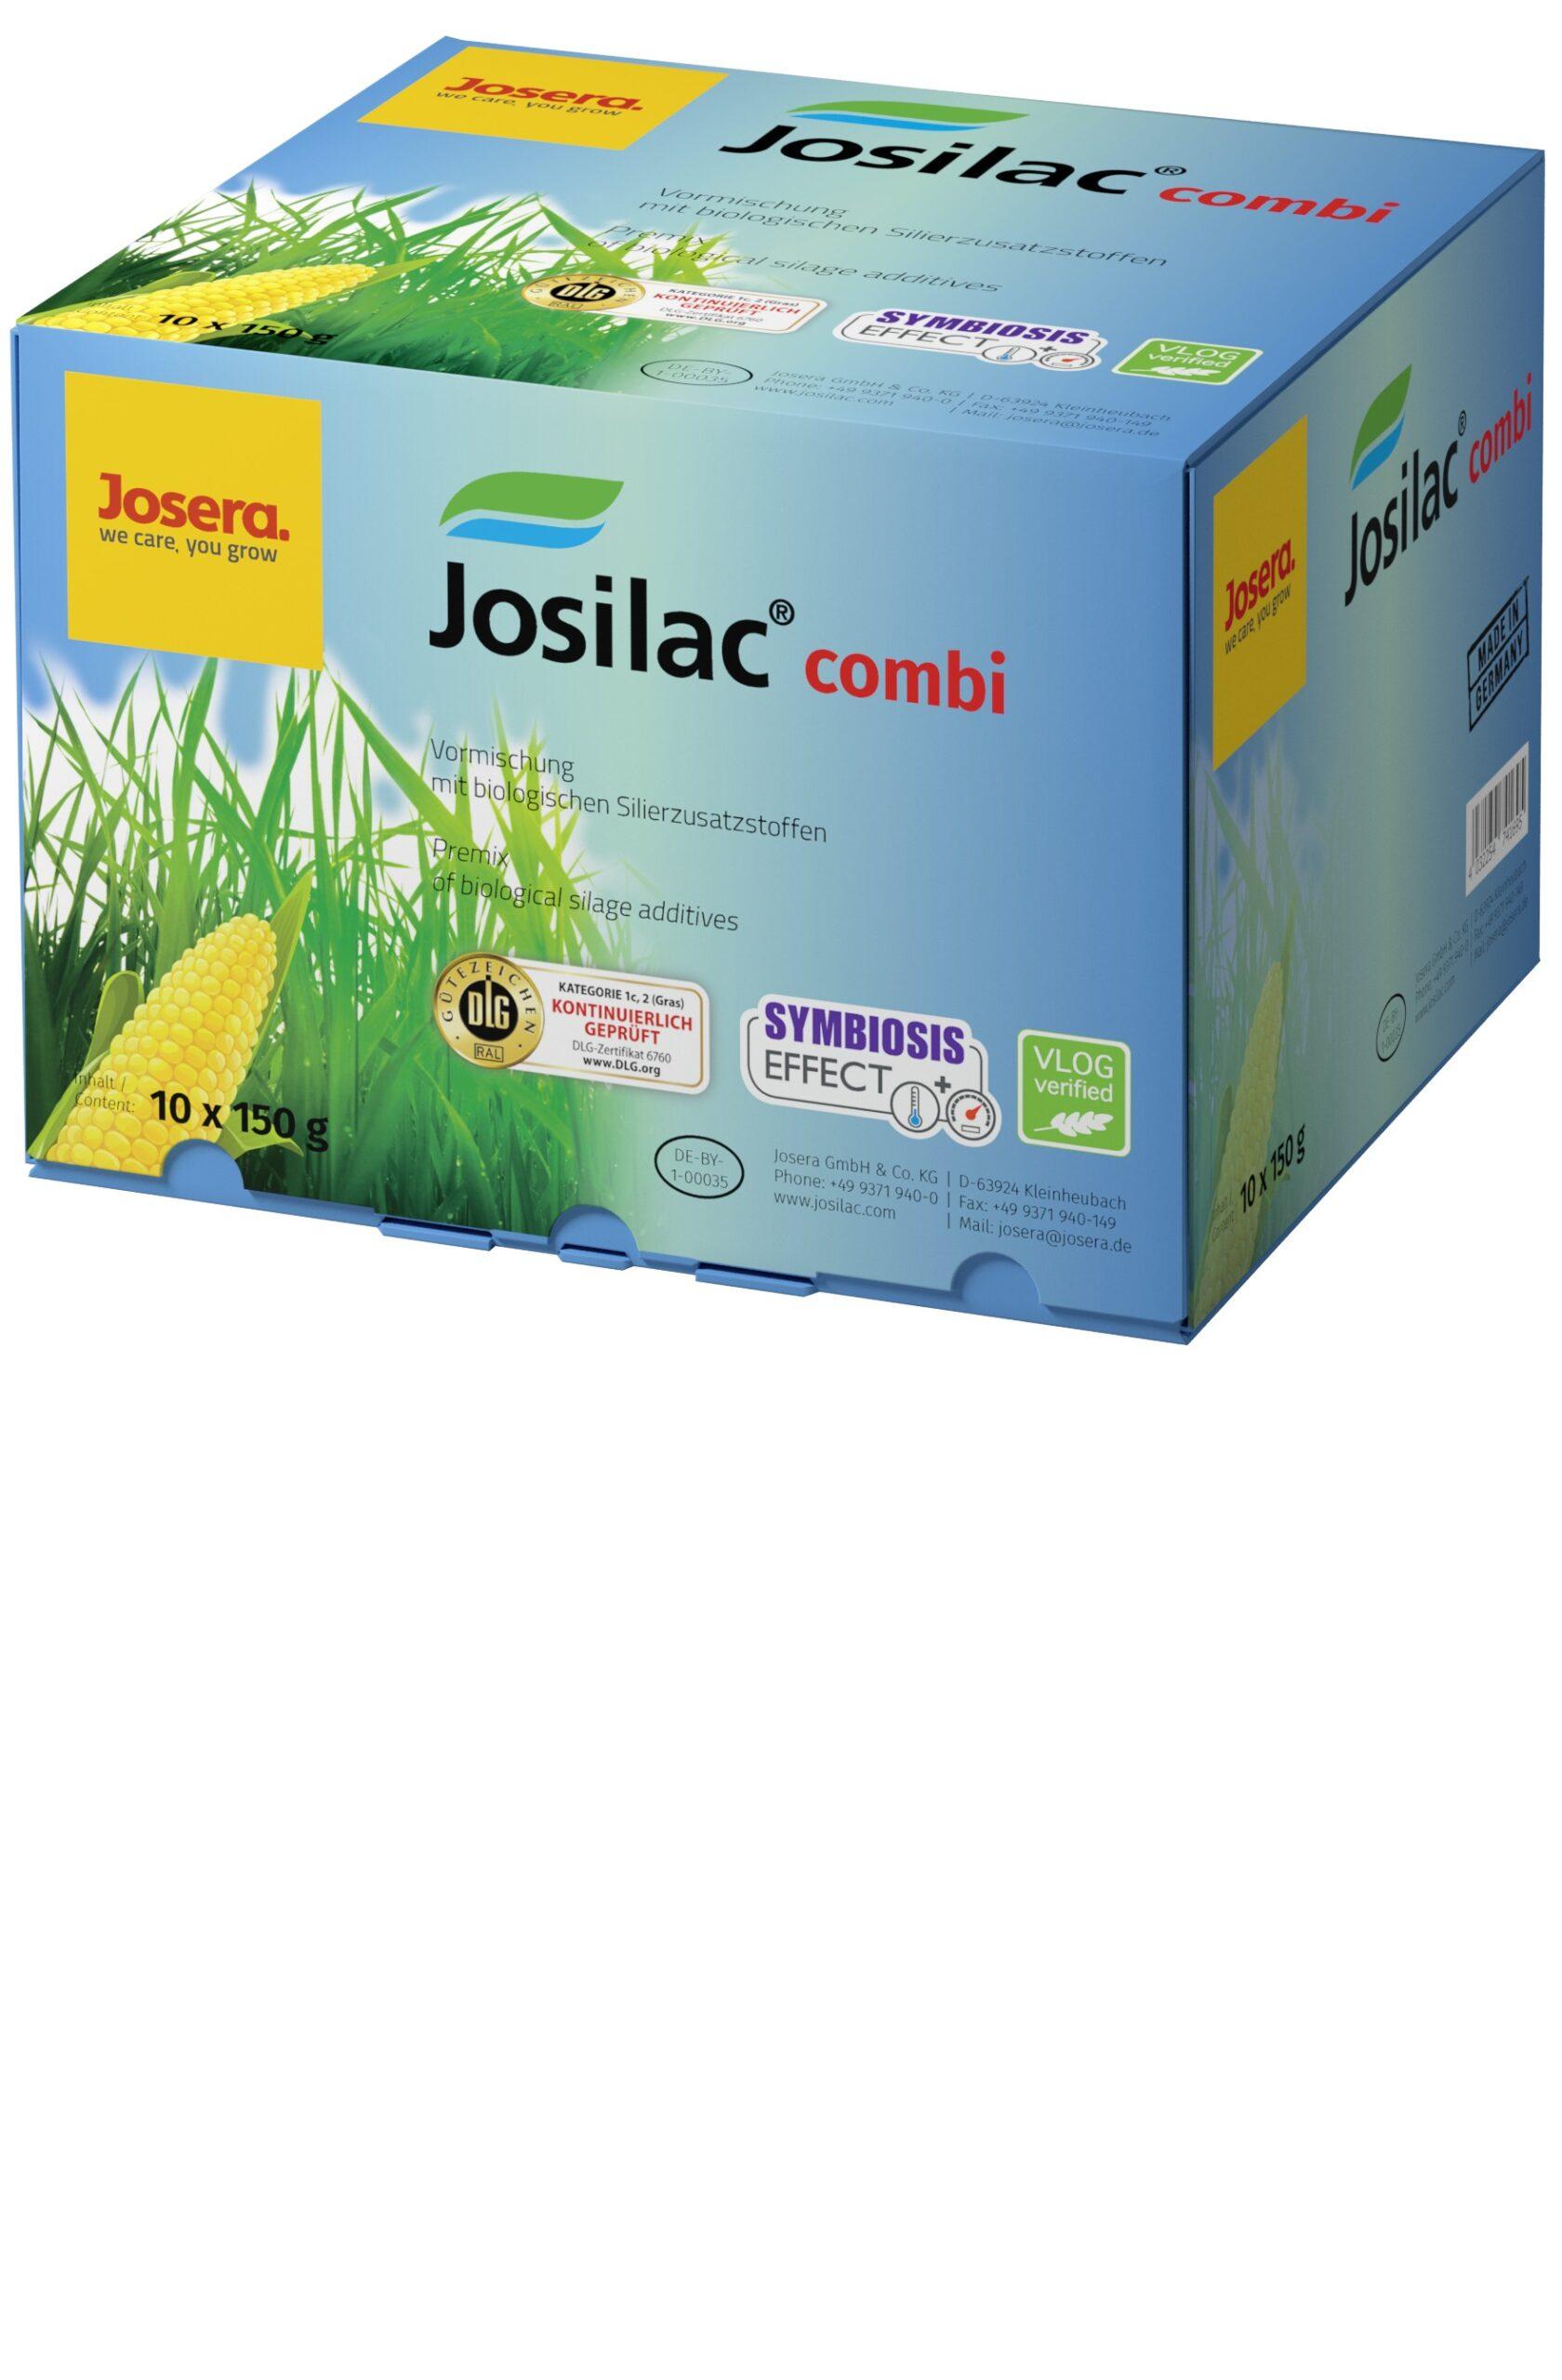 Josilac combi JOSERA